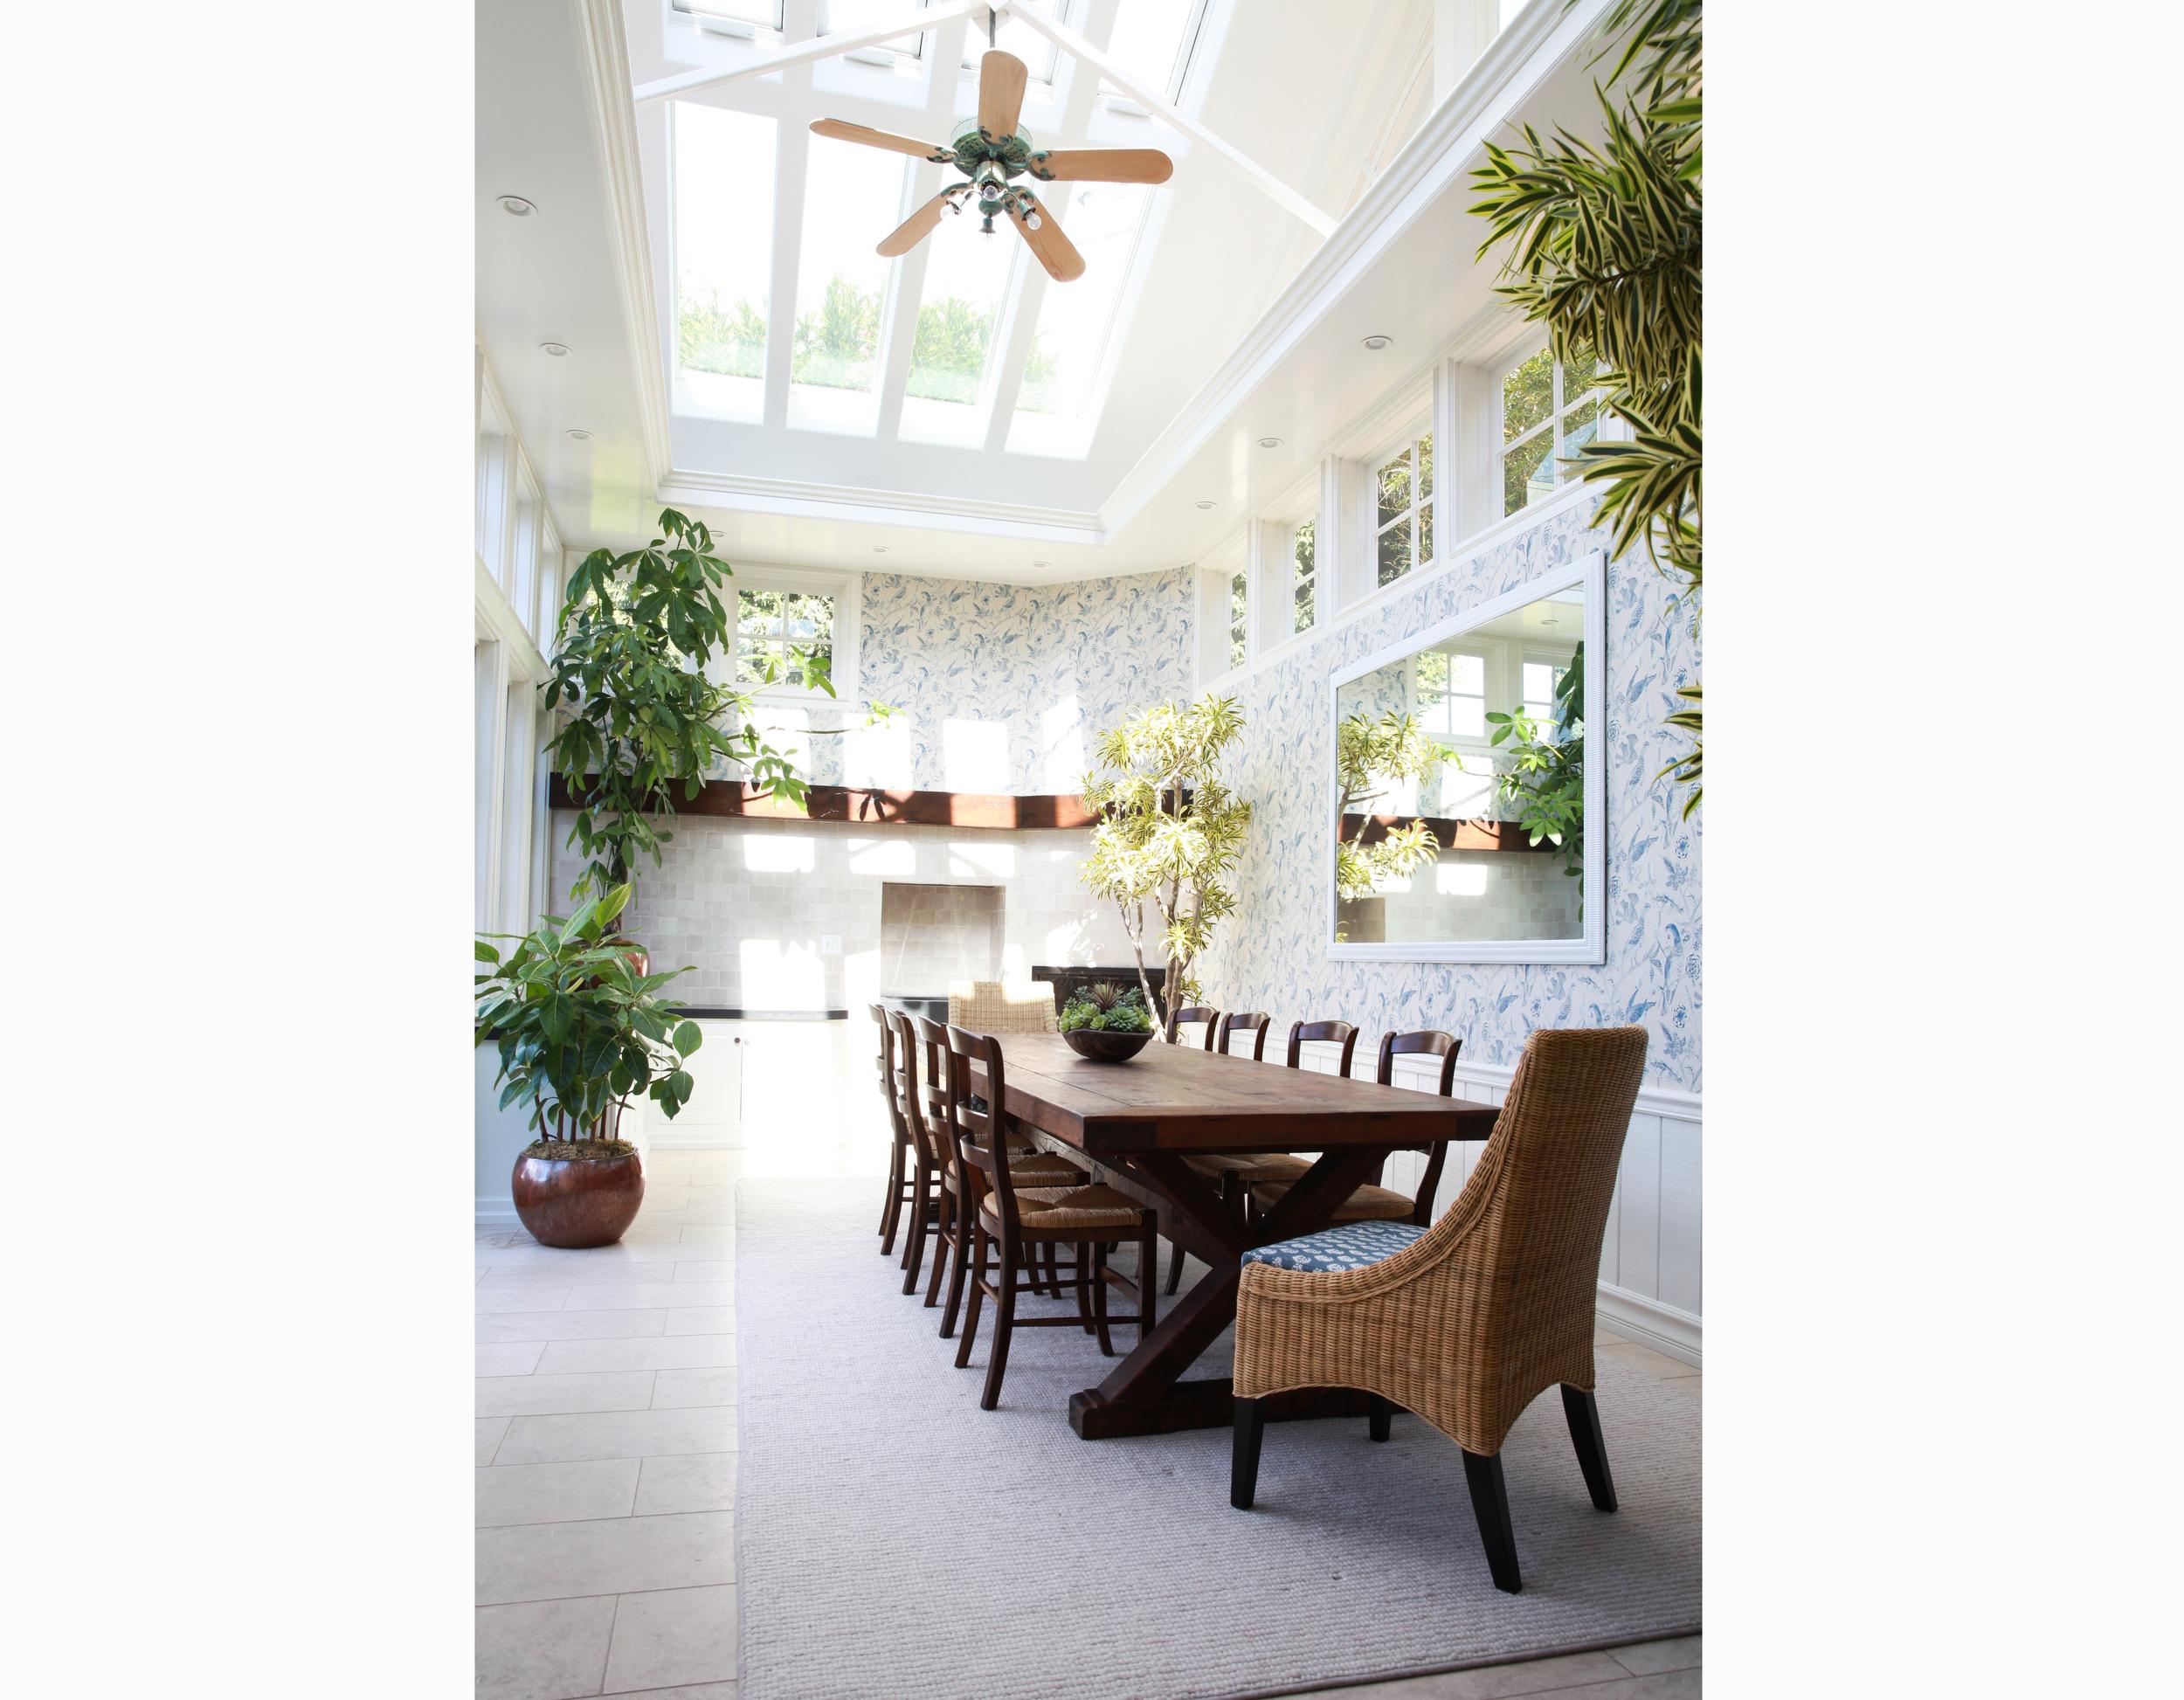 corona del mar newport beach orange county interior design solarium designer.jpg